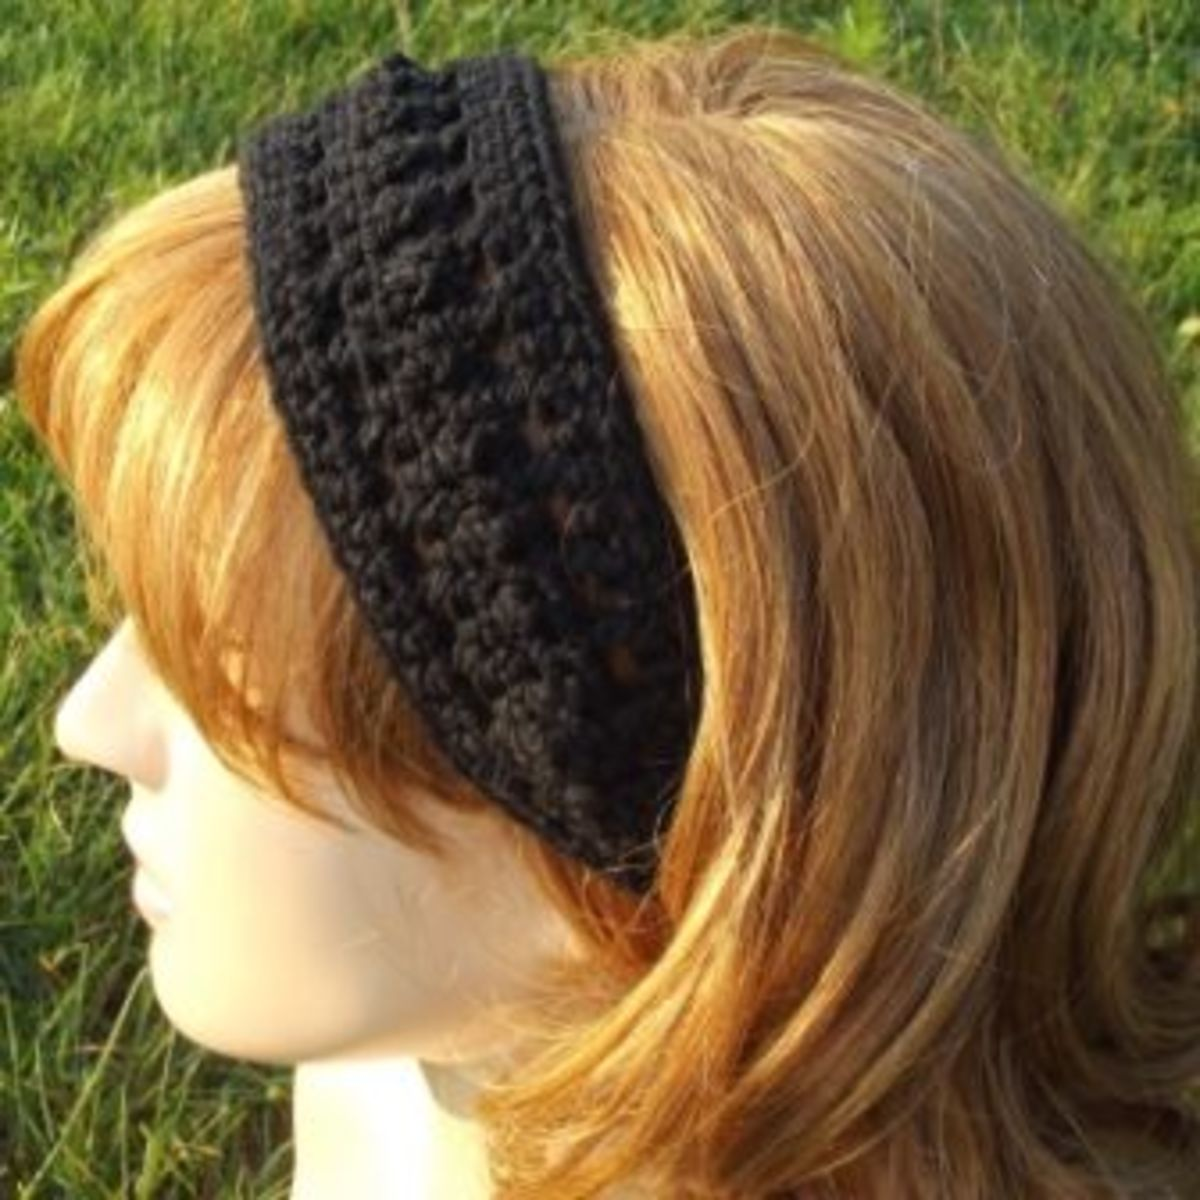 Crocheted black headband.